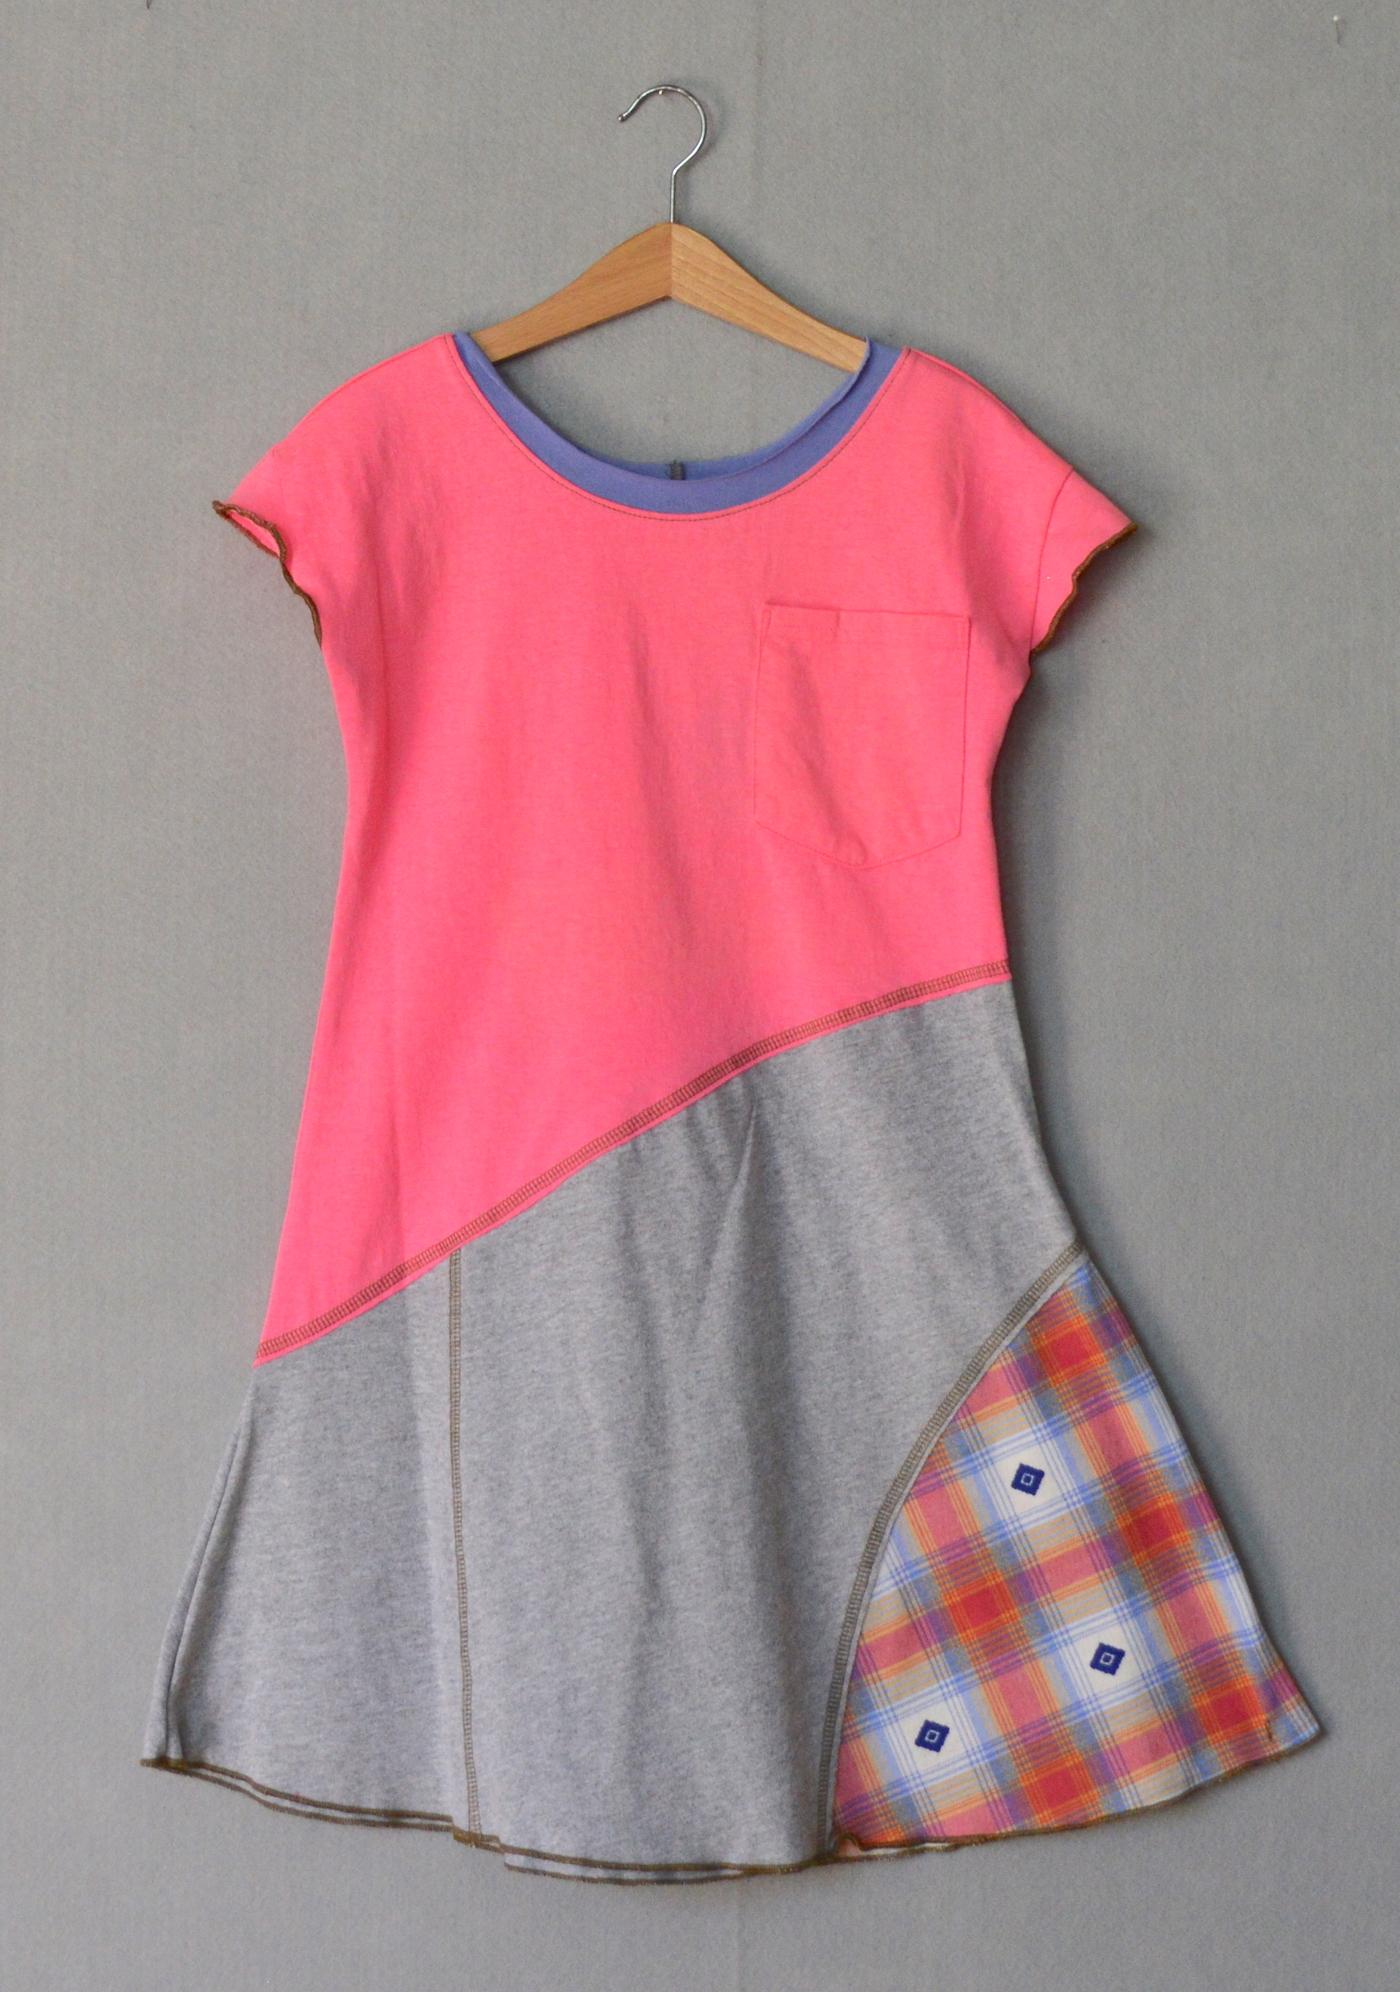 Pink & Gray Girls Dress - L